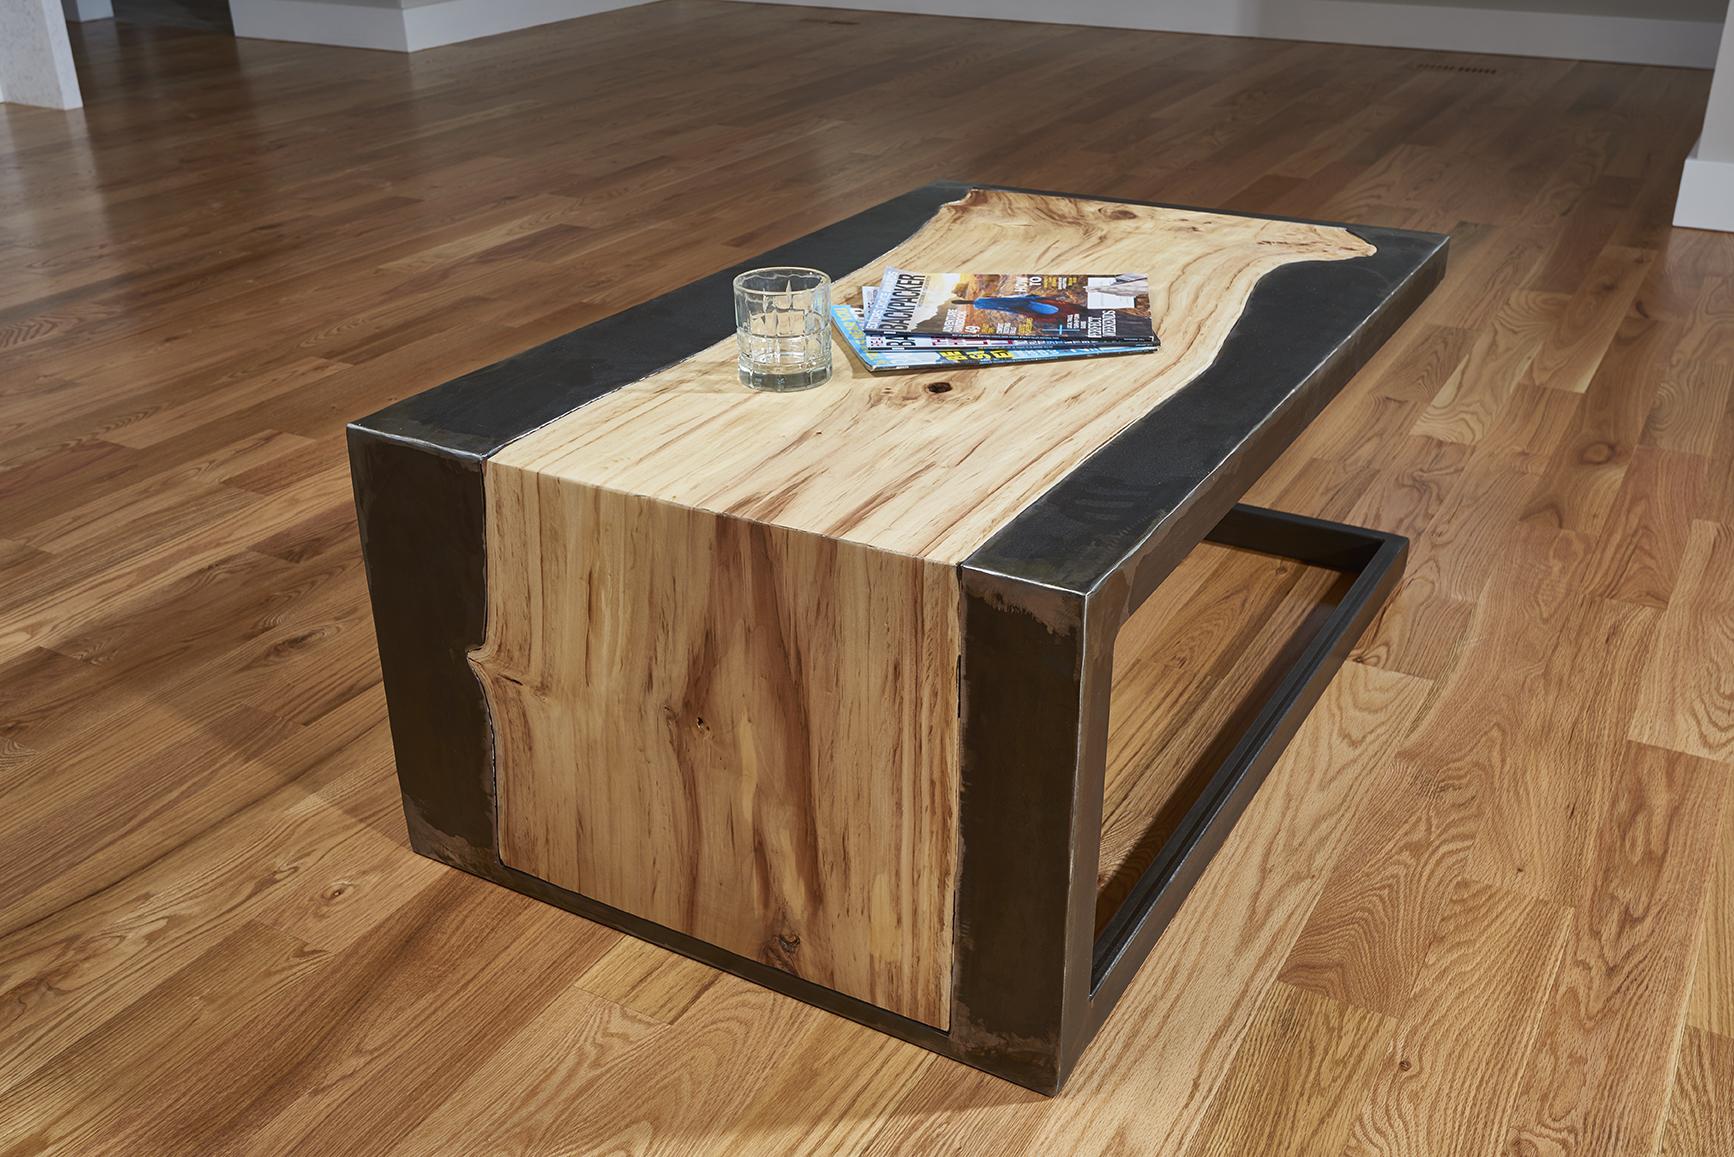 The Tillis Table